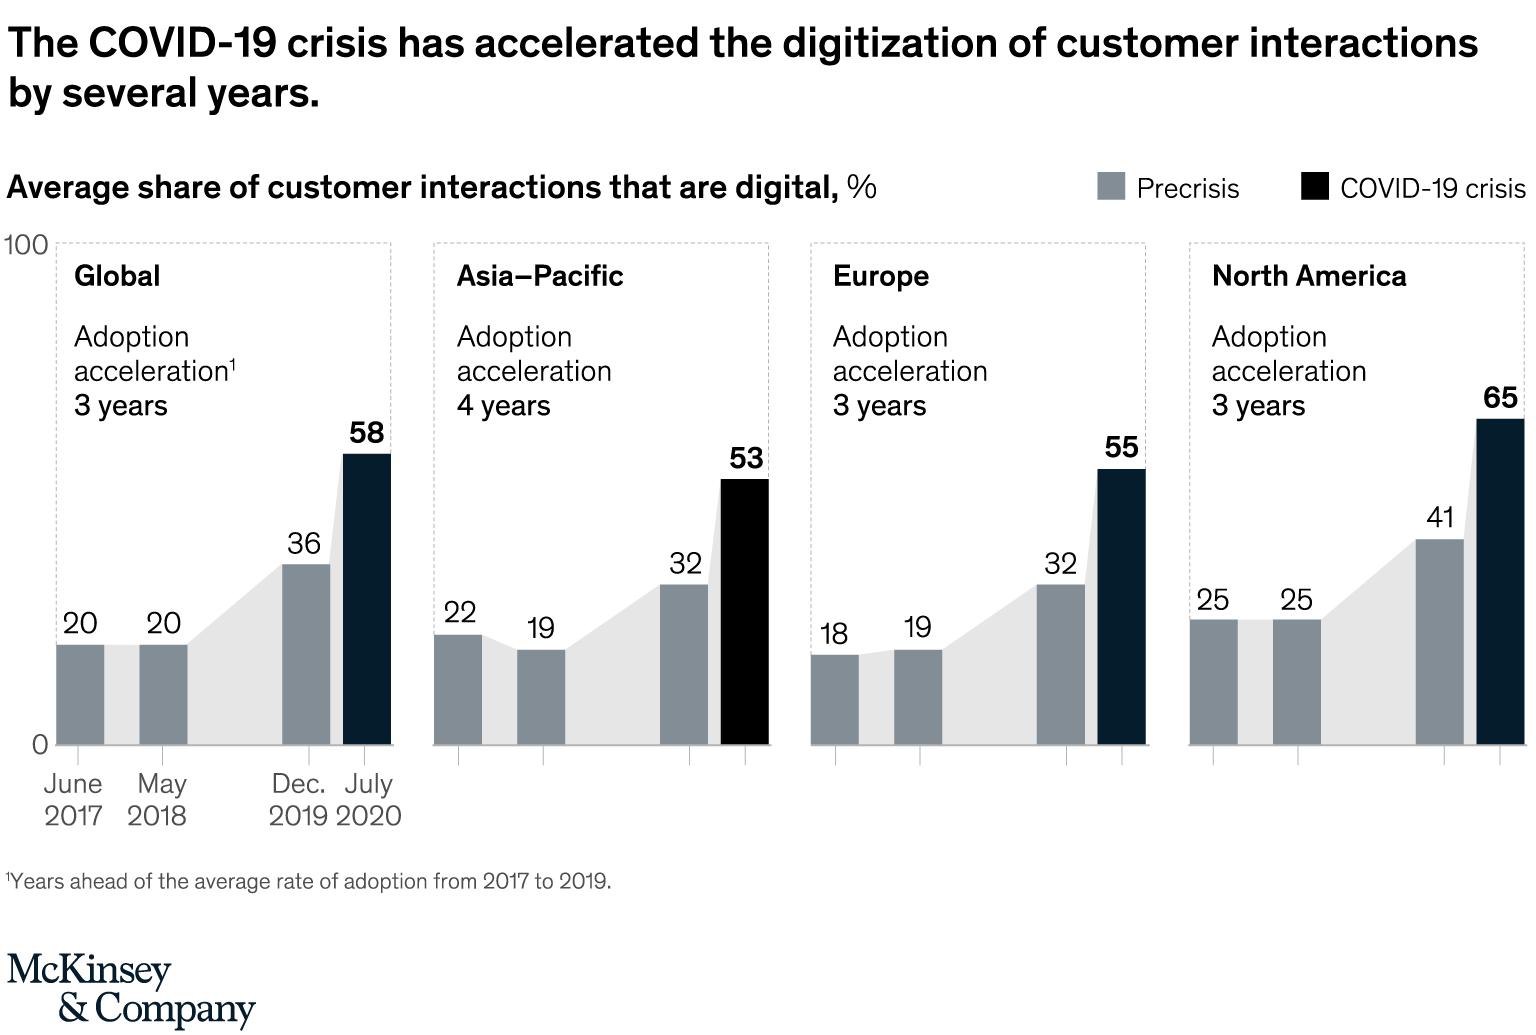 Digital interactions